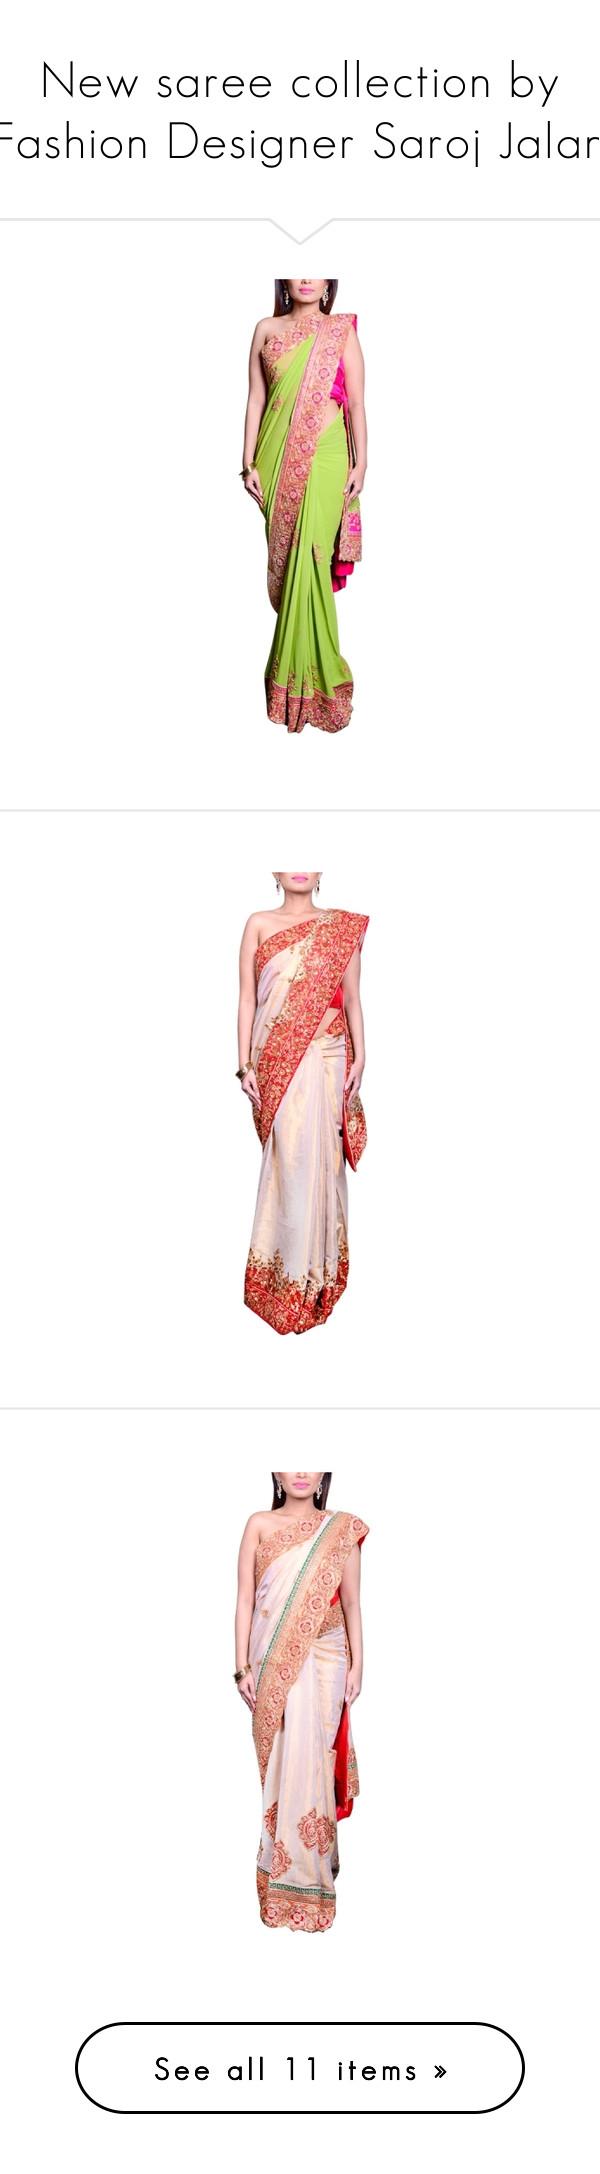 New saree collection by Fashion Designer Saroj Jalan\